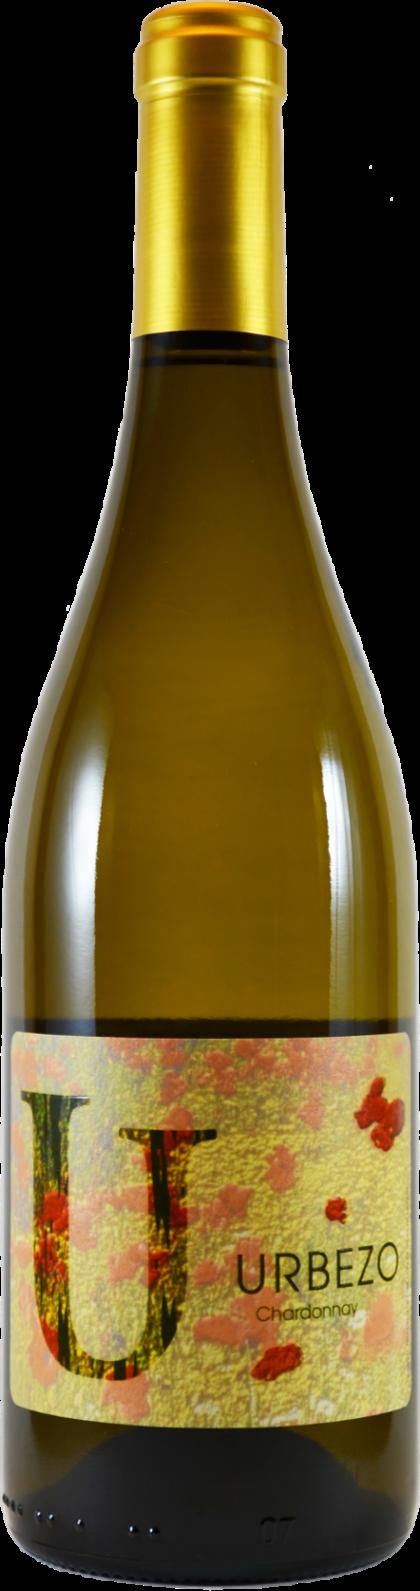 URBEZO Chardonnay 2018 ecológico